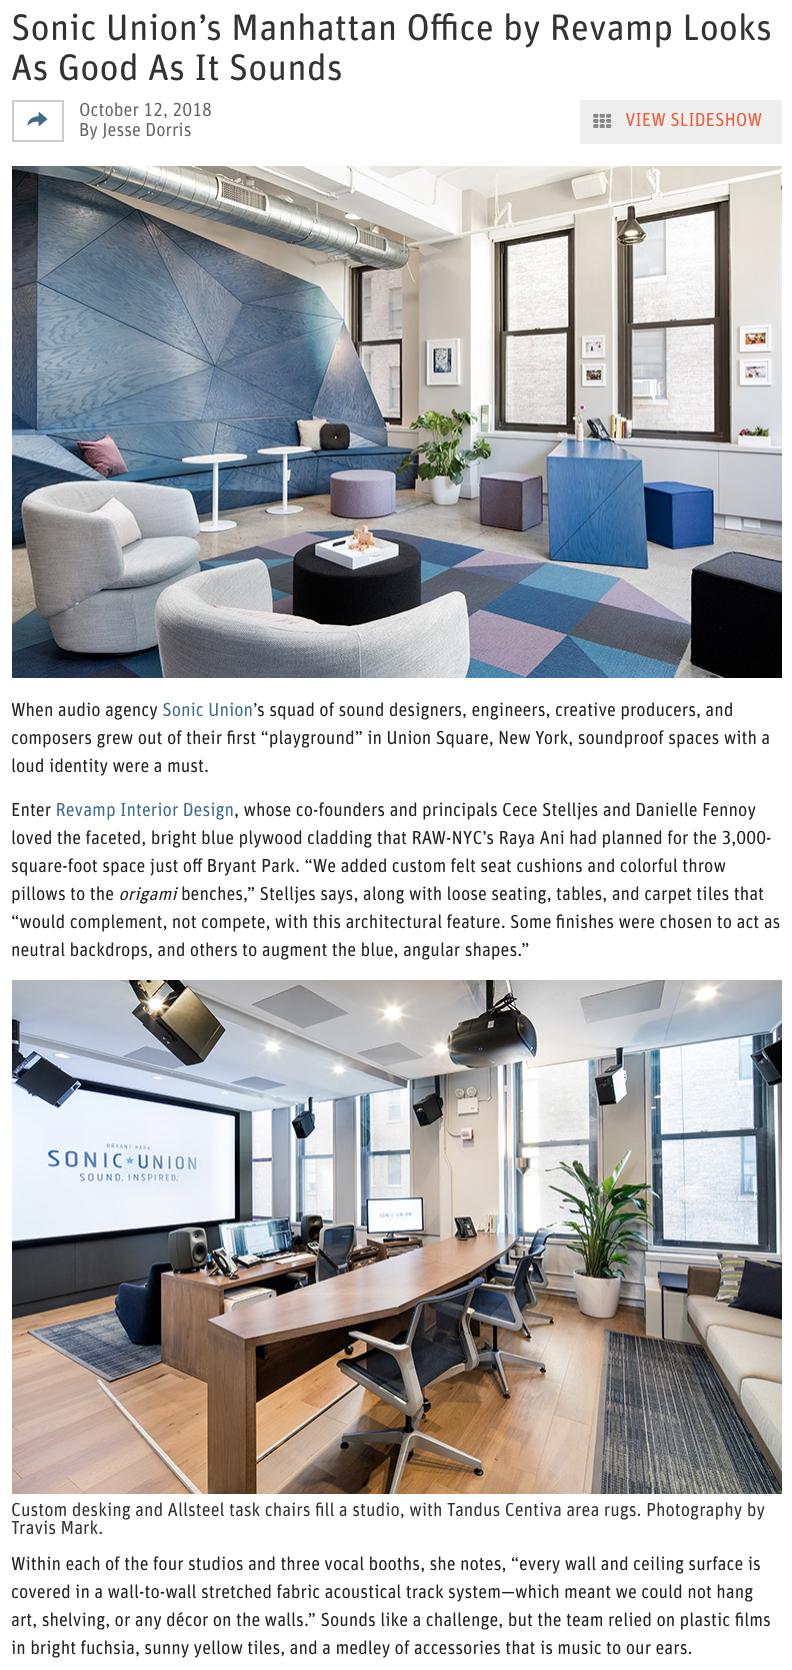 Interior Design - Sonic Union - Screenshot.png